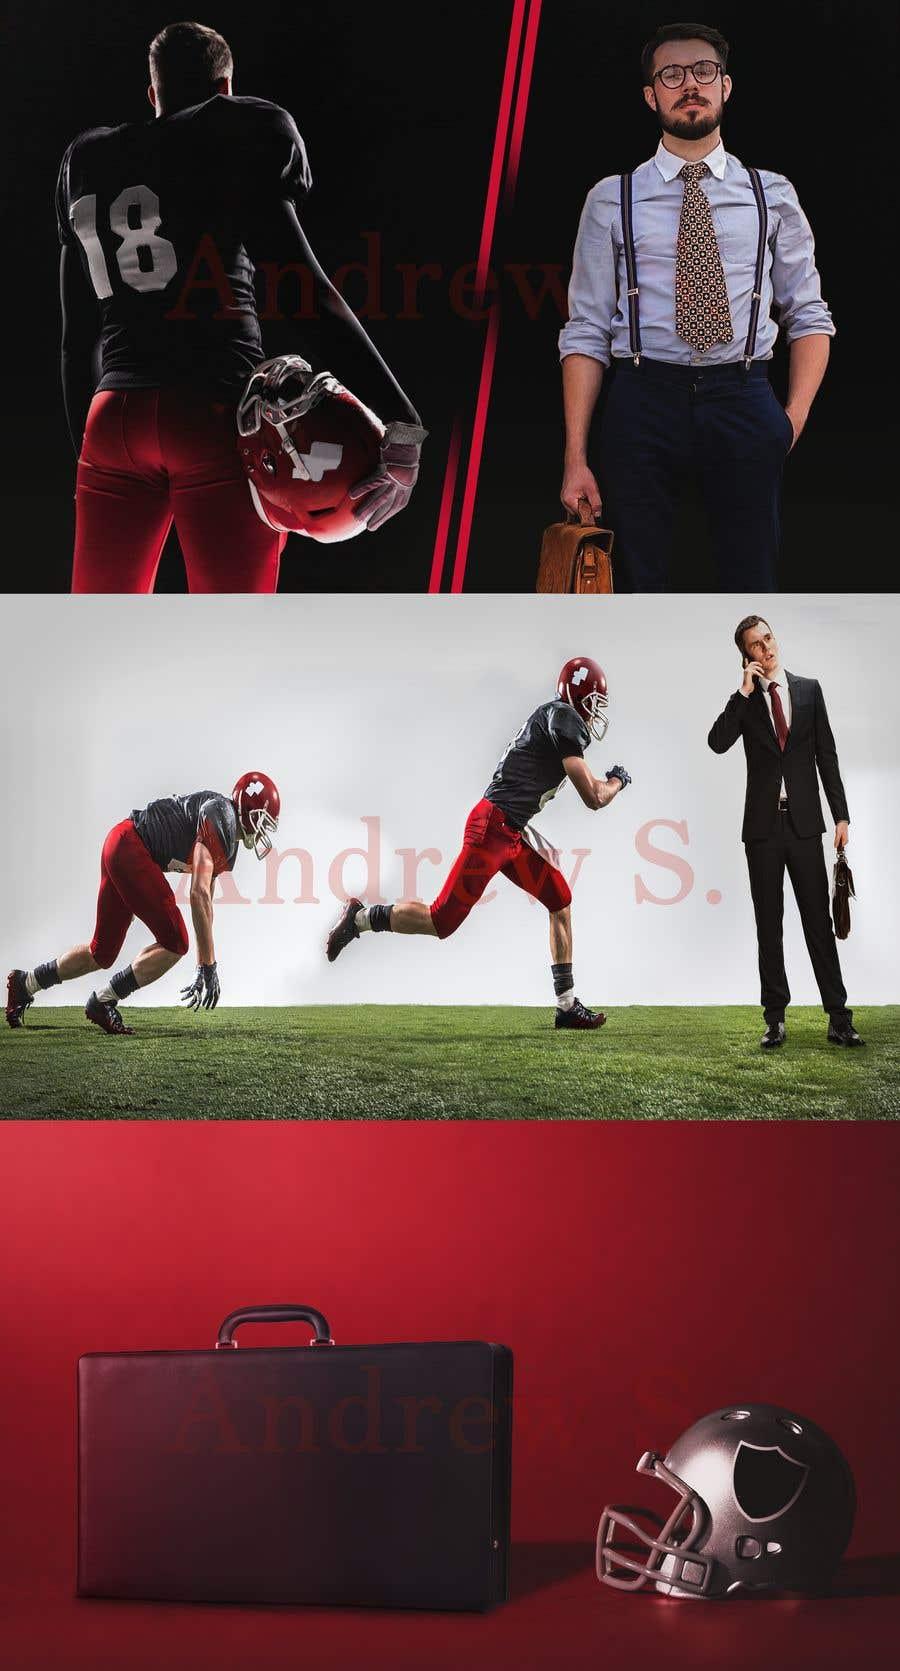 Penyertaan Peraduan #                                        22                                      untuk                                         NFL transition pictures for website